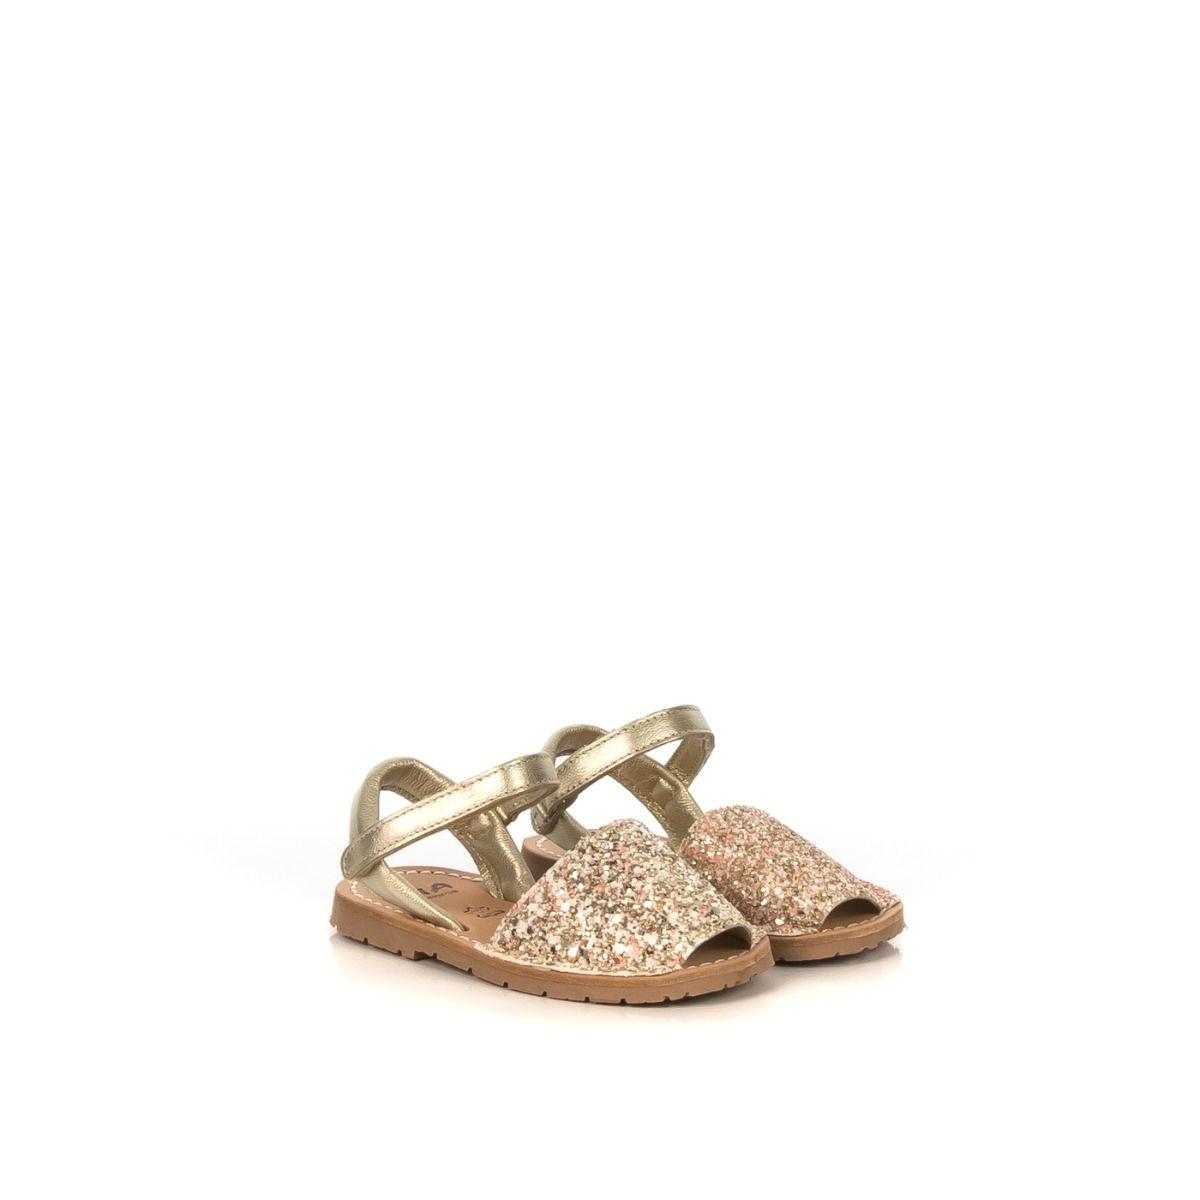 Menorca 20090 Online Shop Bambina Glitter Sandalo Rosa Ria Rdqhst 21224 JTK1F3lc